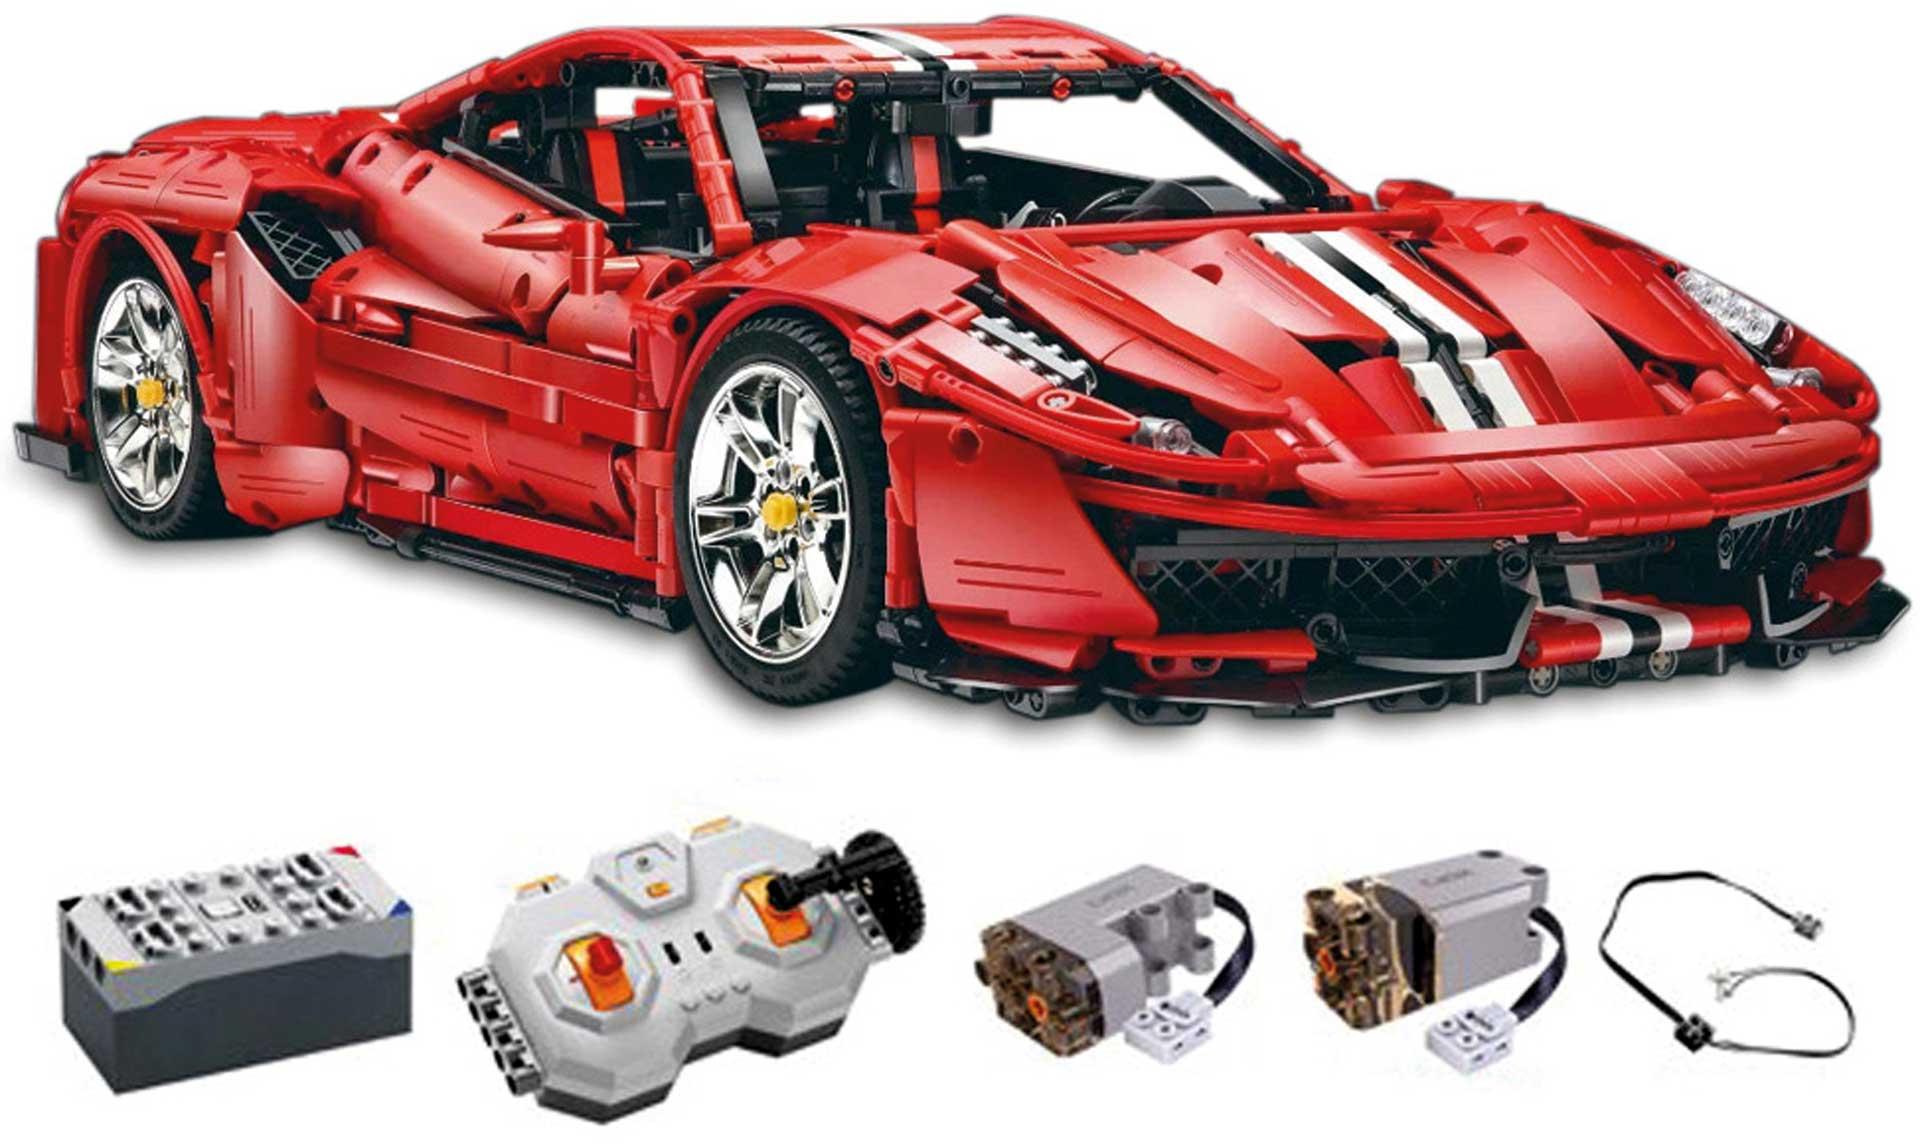 CADA Master Red Super Car 1:8 (3187 Teile) inkl. Power System